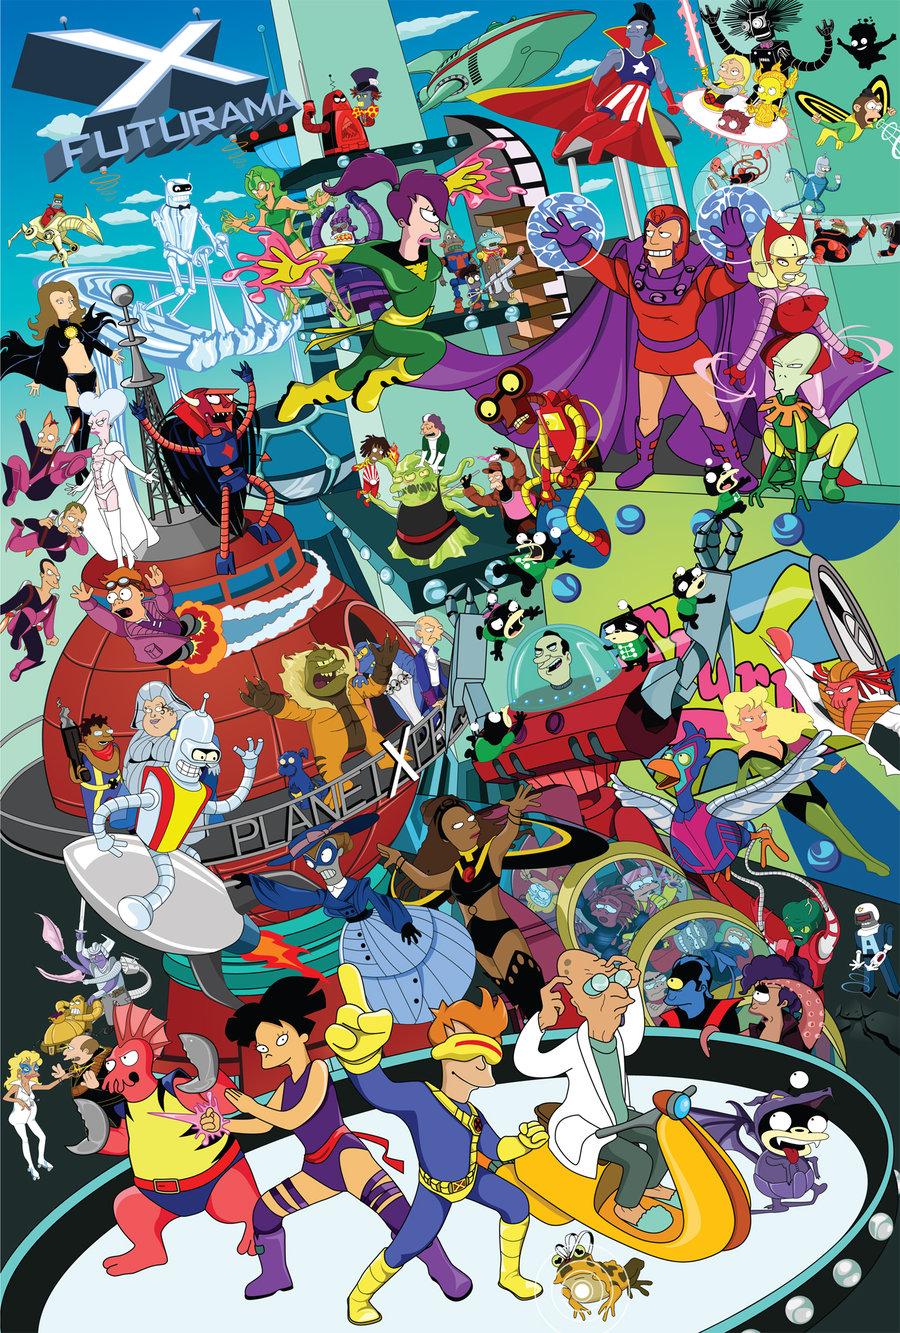 Kelly 39 s blog futurama wallpaper - Futurama wallpaper ...